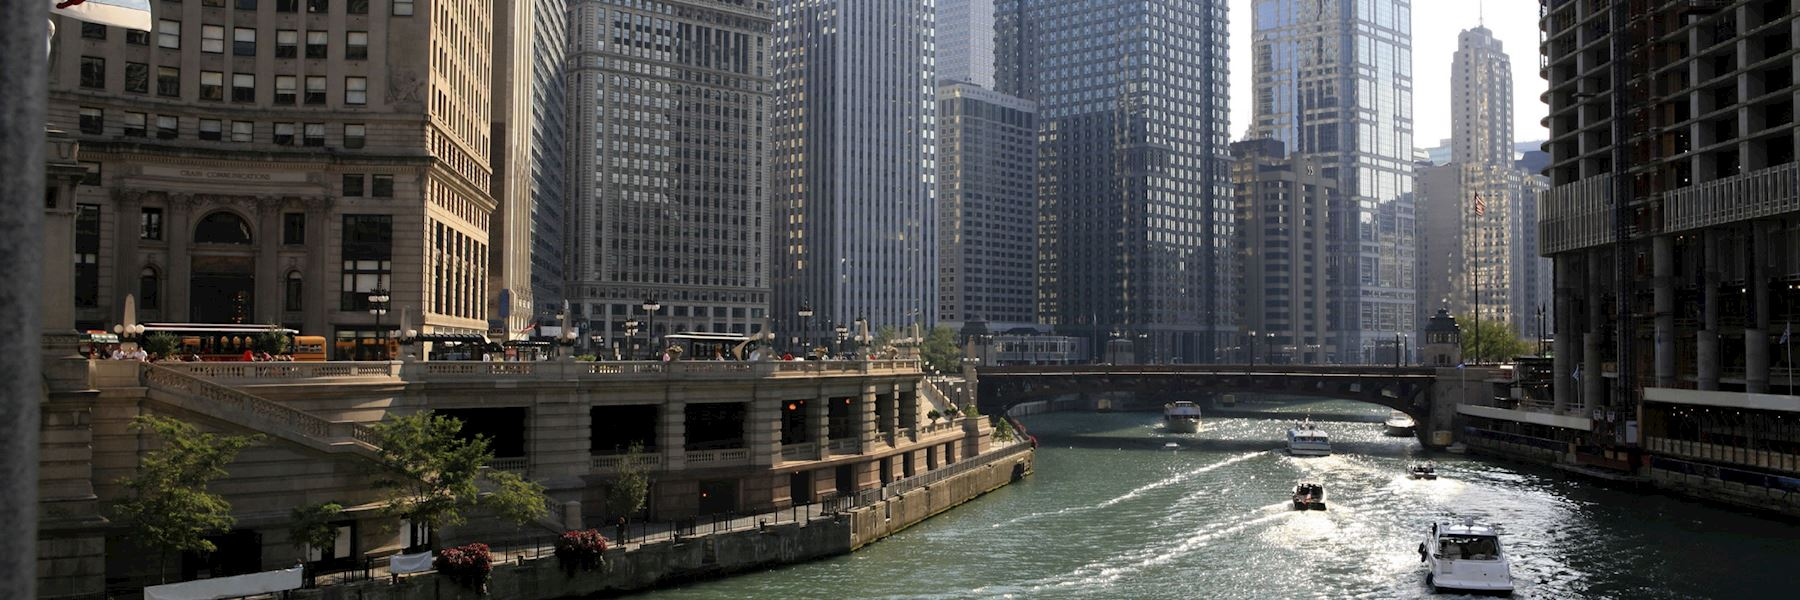 Visit Chicago, USA